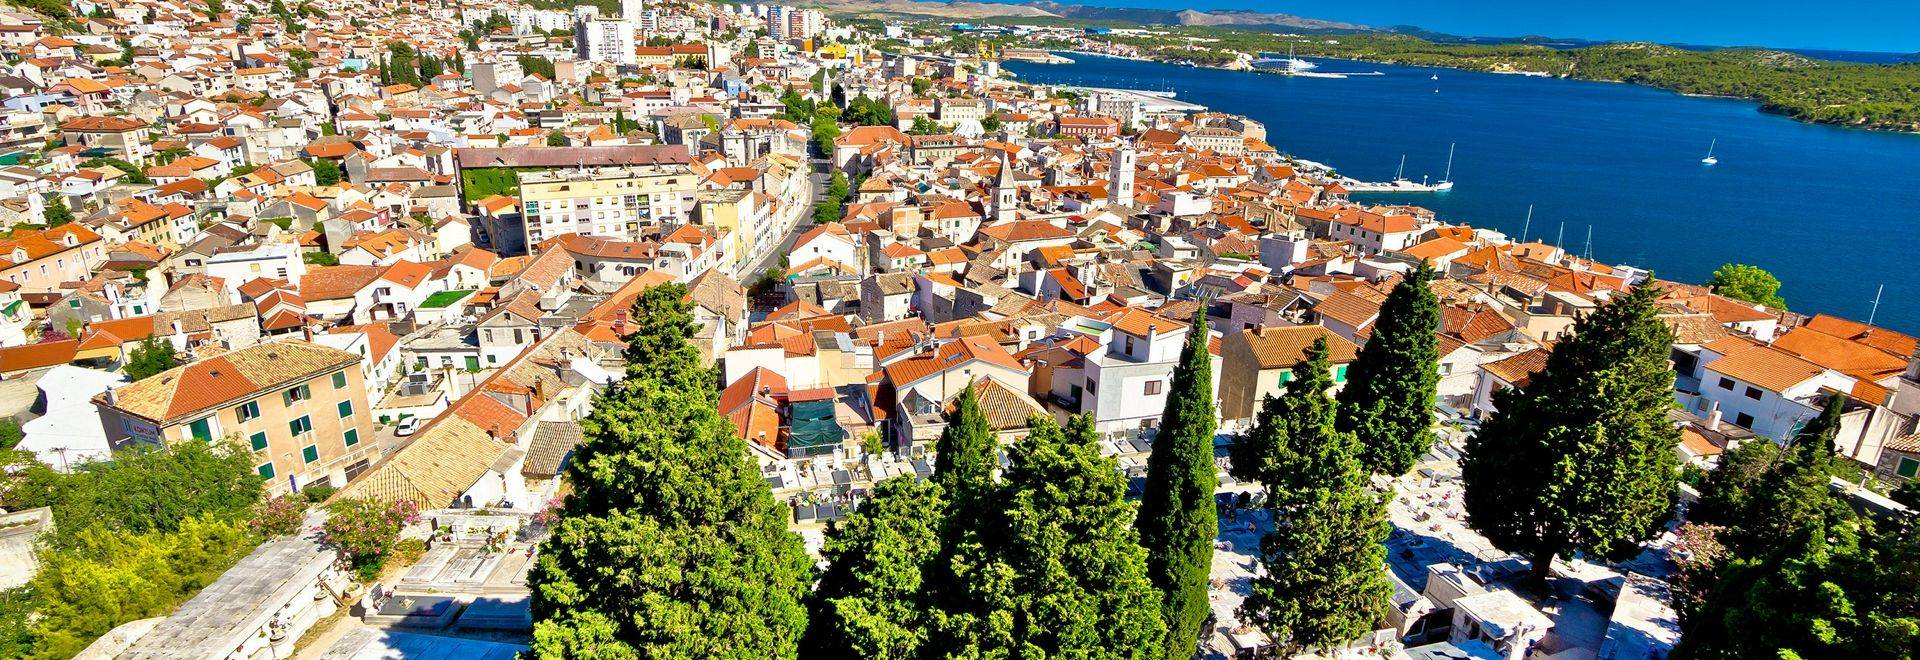 Shutterstock 334347884 Adriatic Town Of Sibenik Aerial View